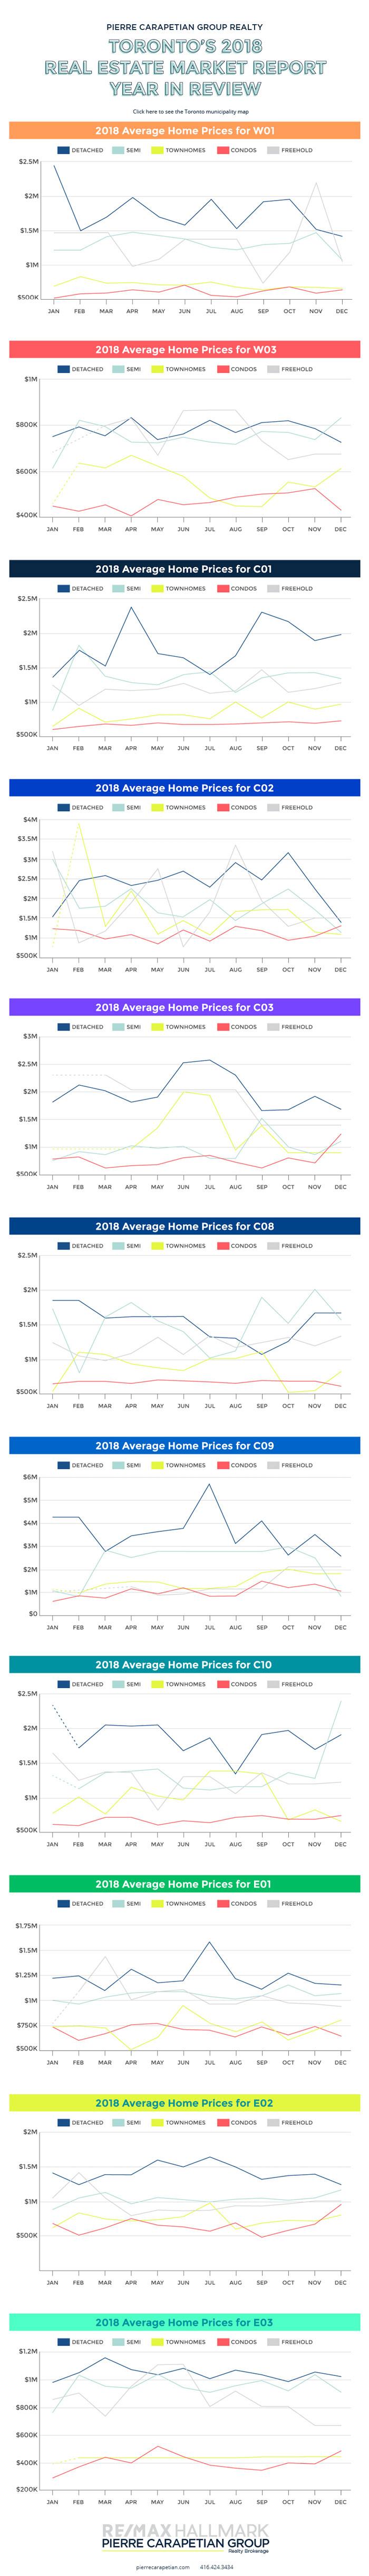 Toronto's 2018 real estate market average sale price infographic